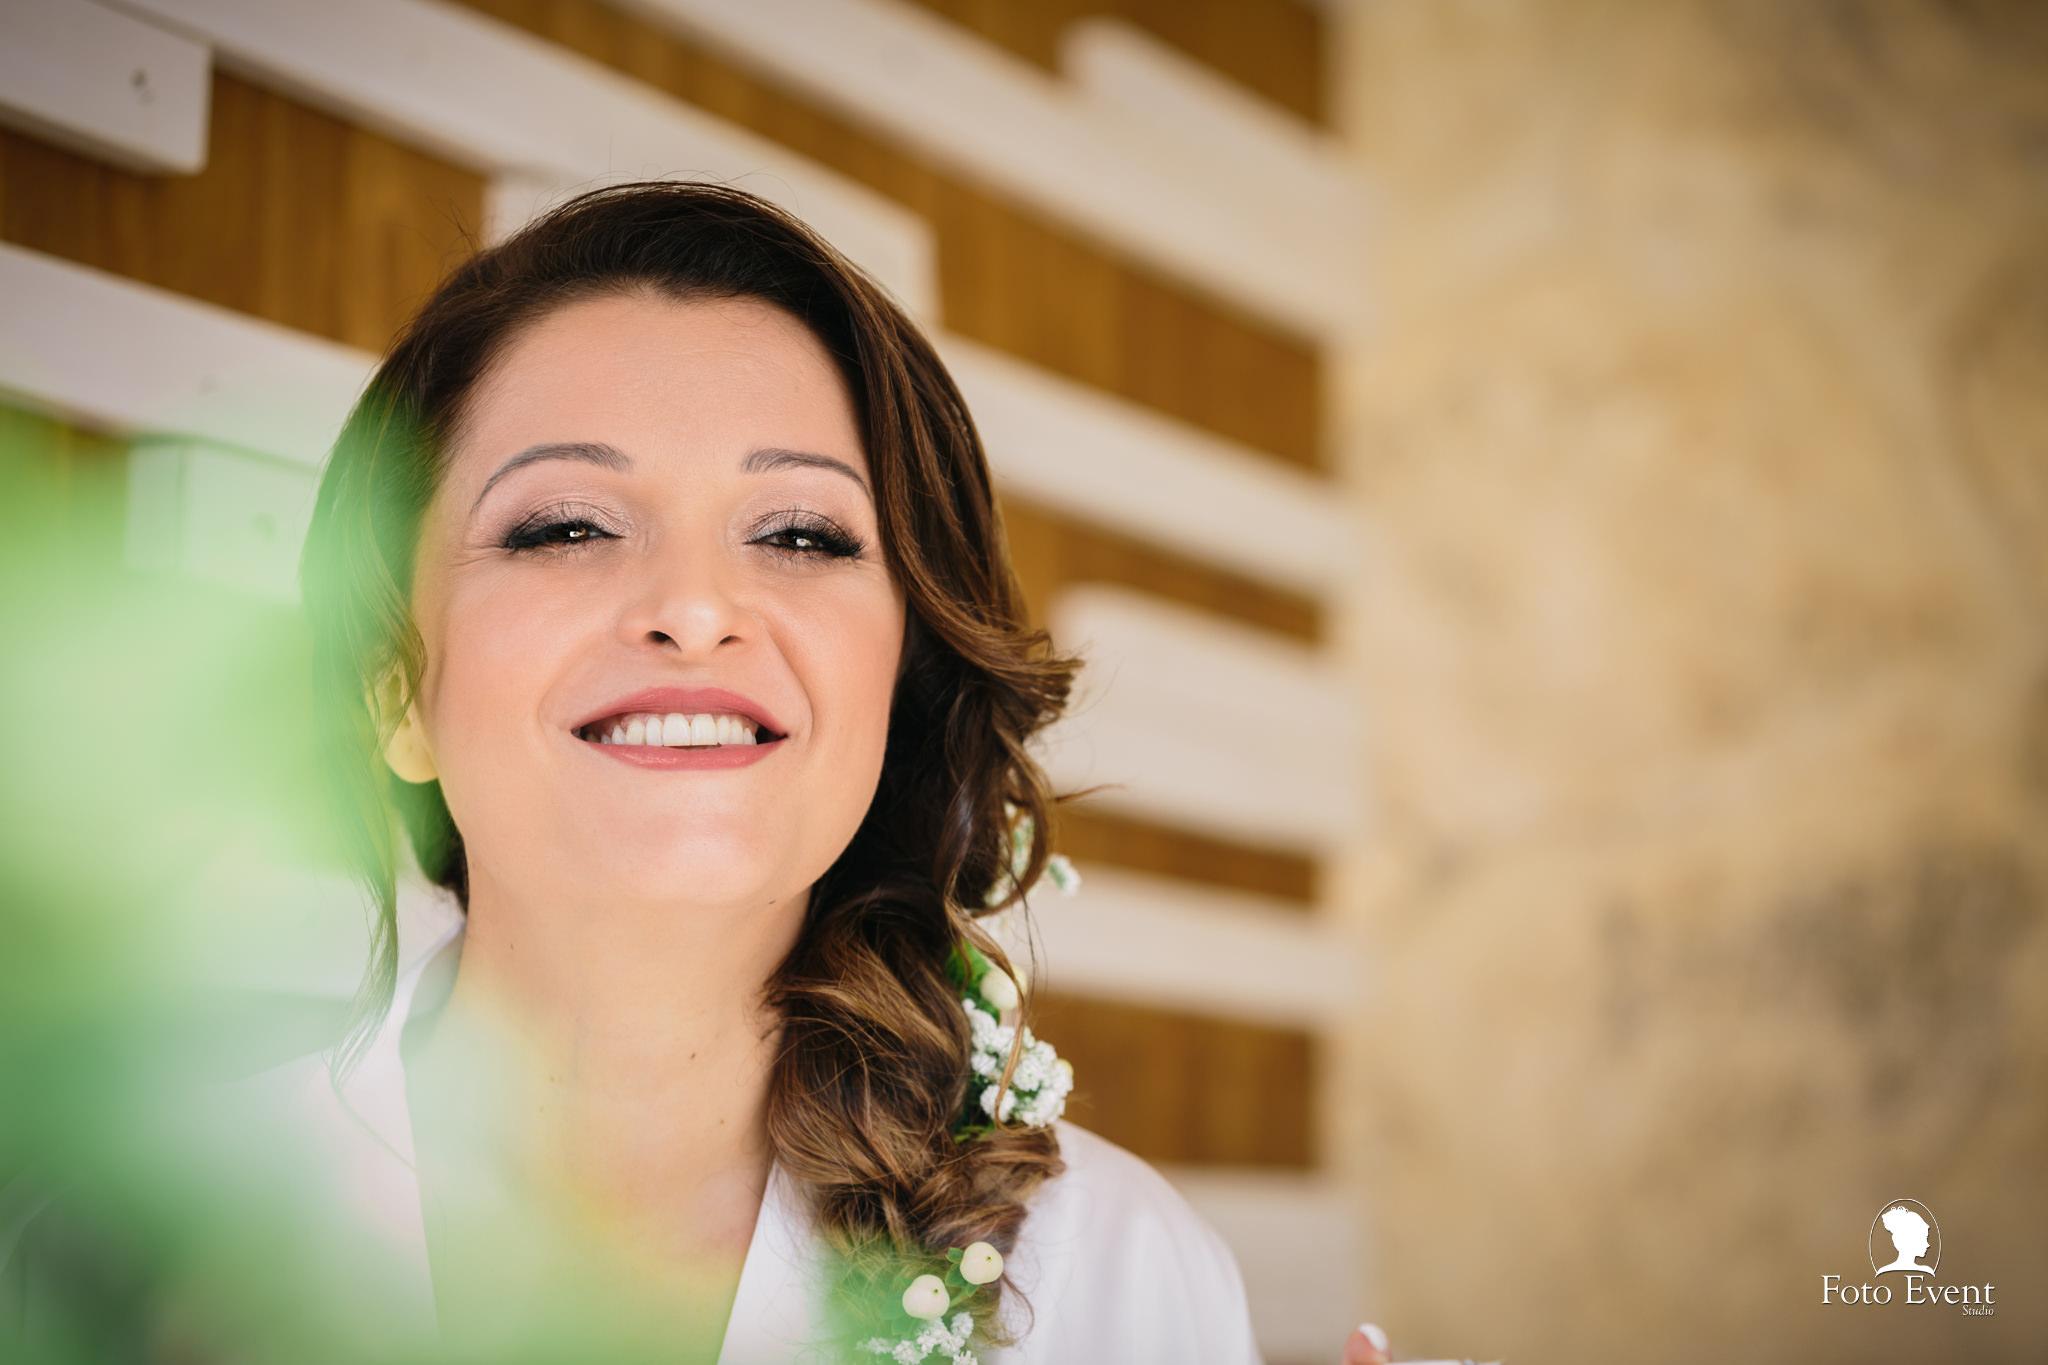 016-2020-10-15-Matrimonio-Noemi-e-Salvatore-Paterno-zoom-234-Edit